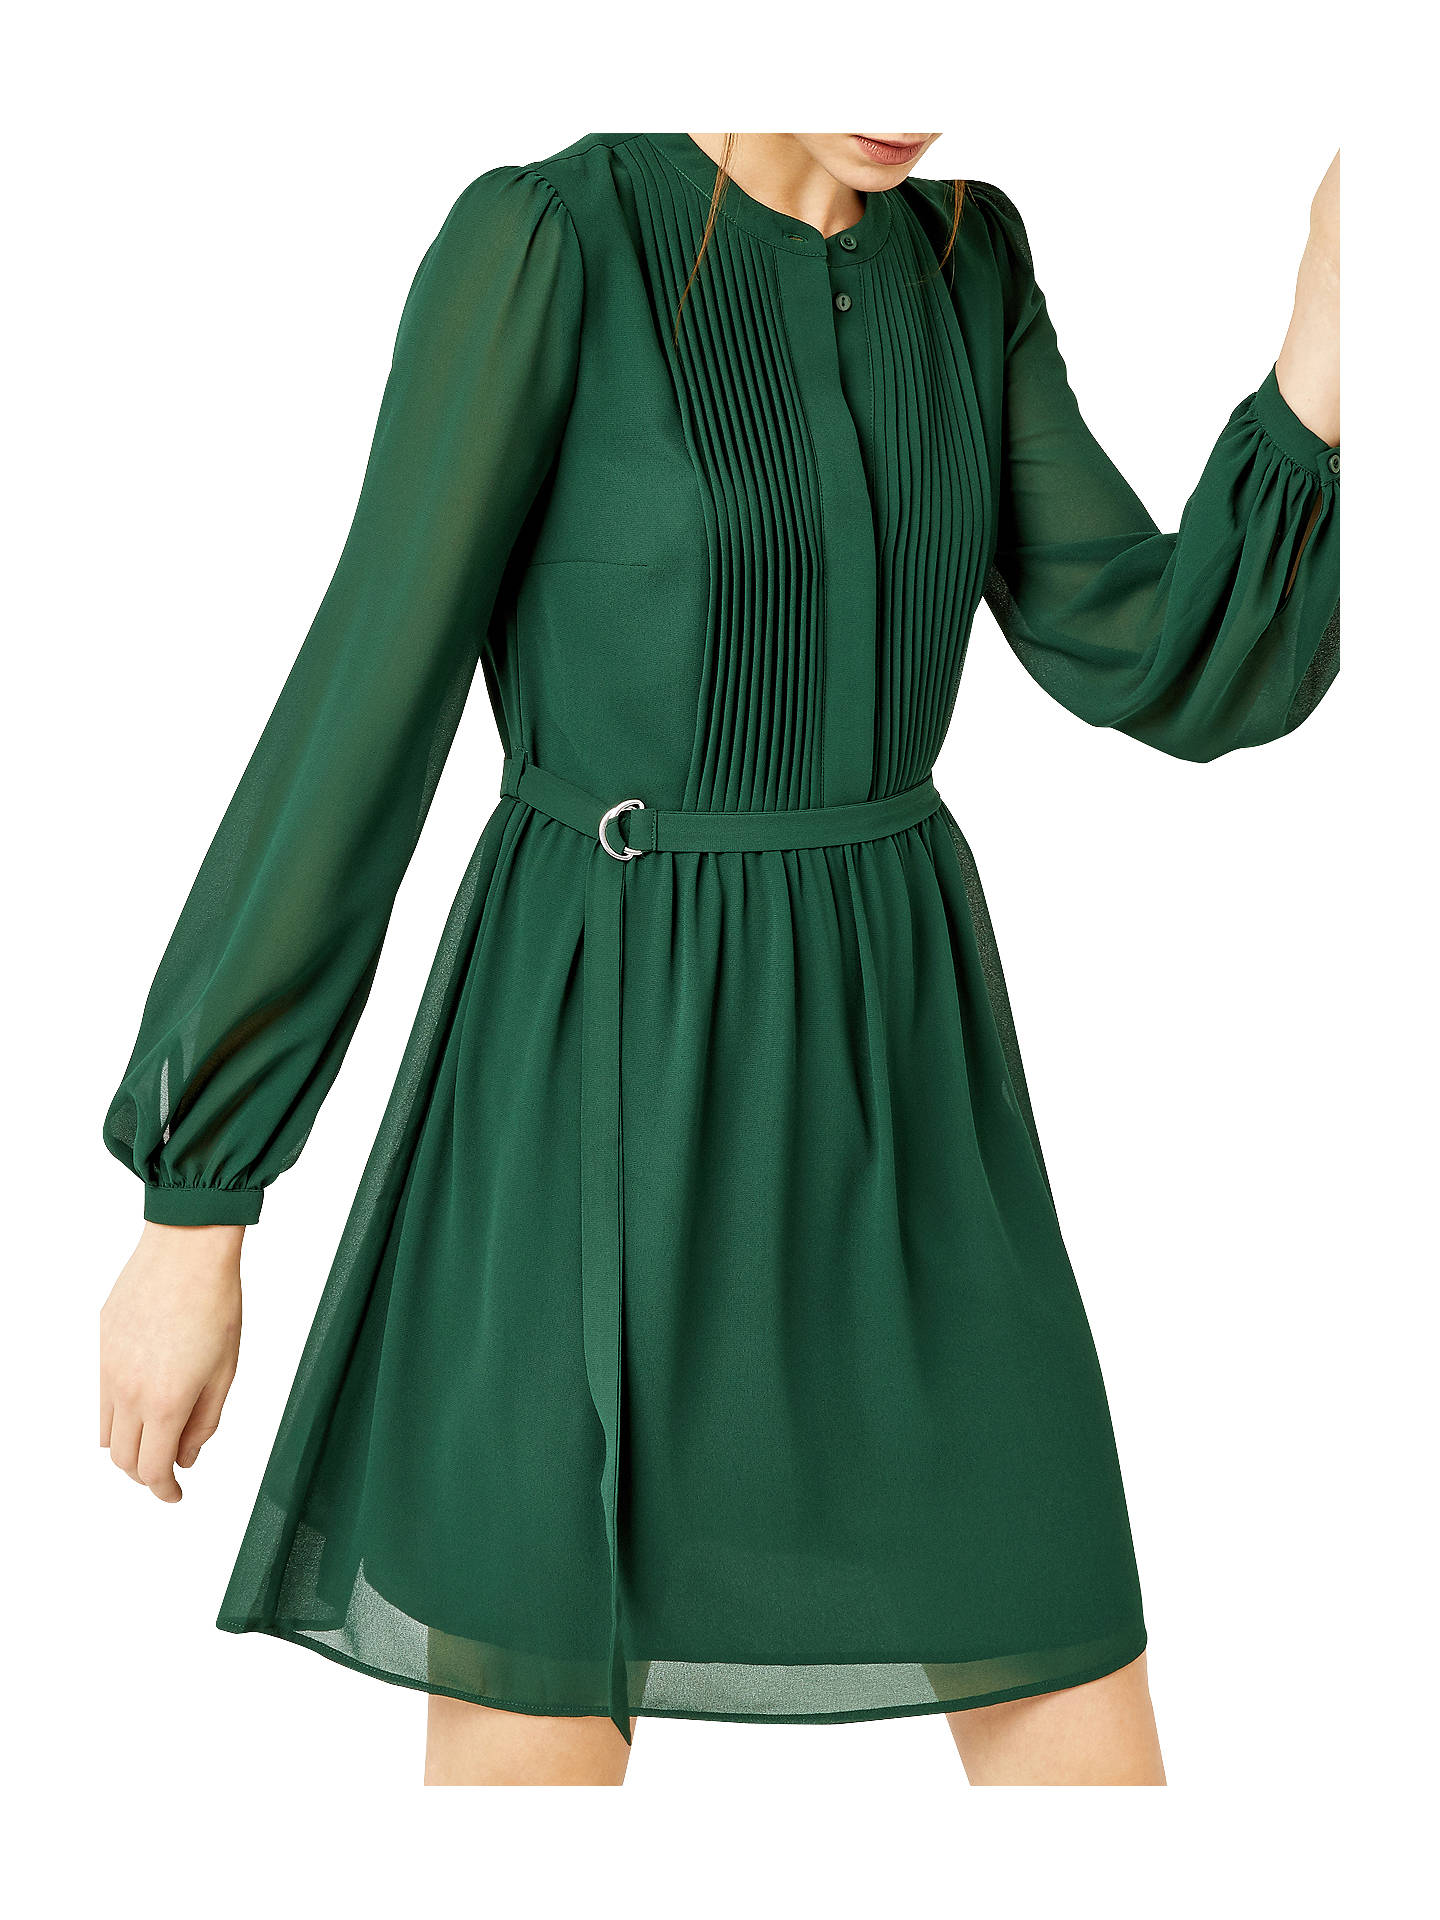 d3efda5eee21 Buy Warehouse Chiffon Shirt Dress, Dark Green, 6 Online at johnlewis.com ...